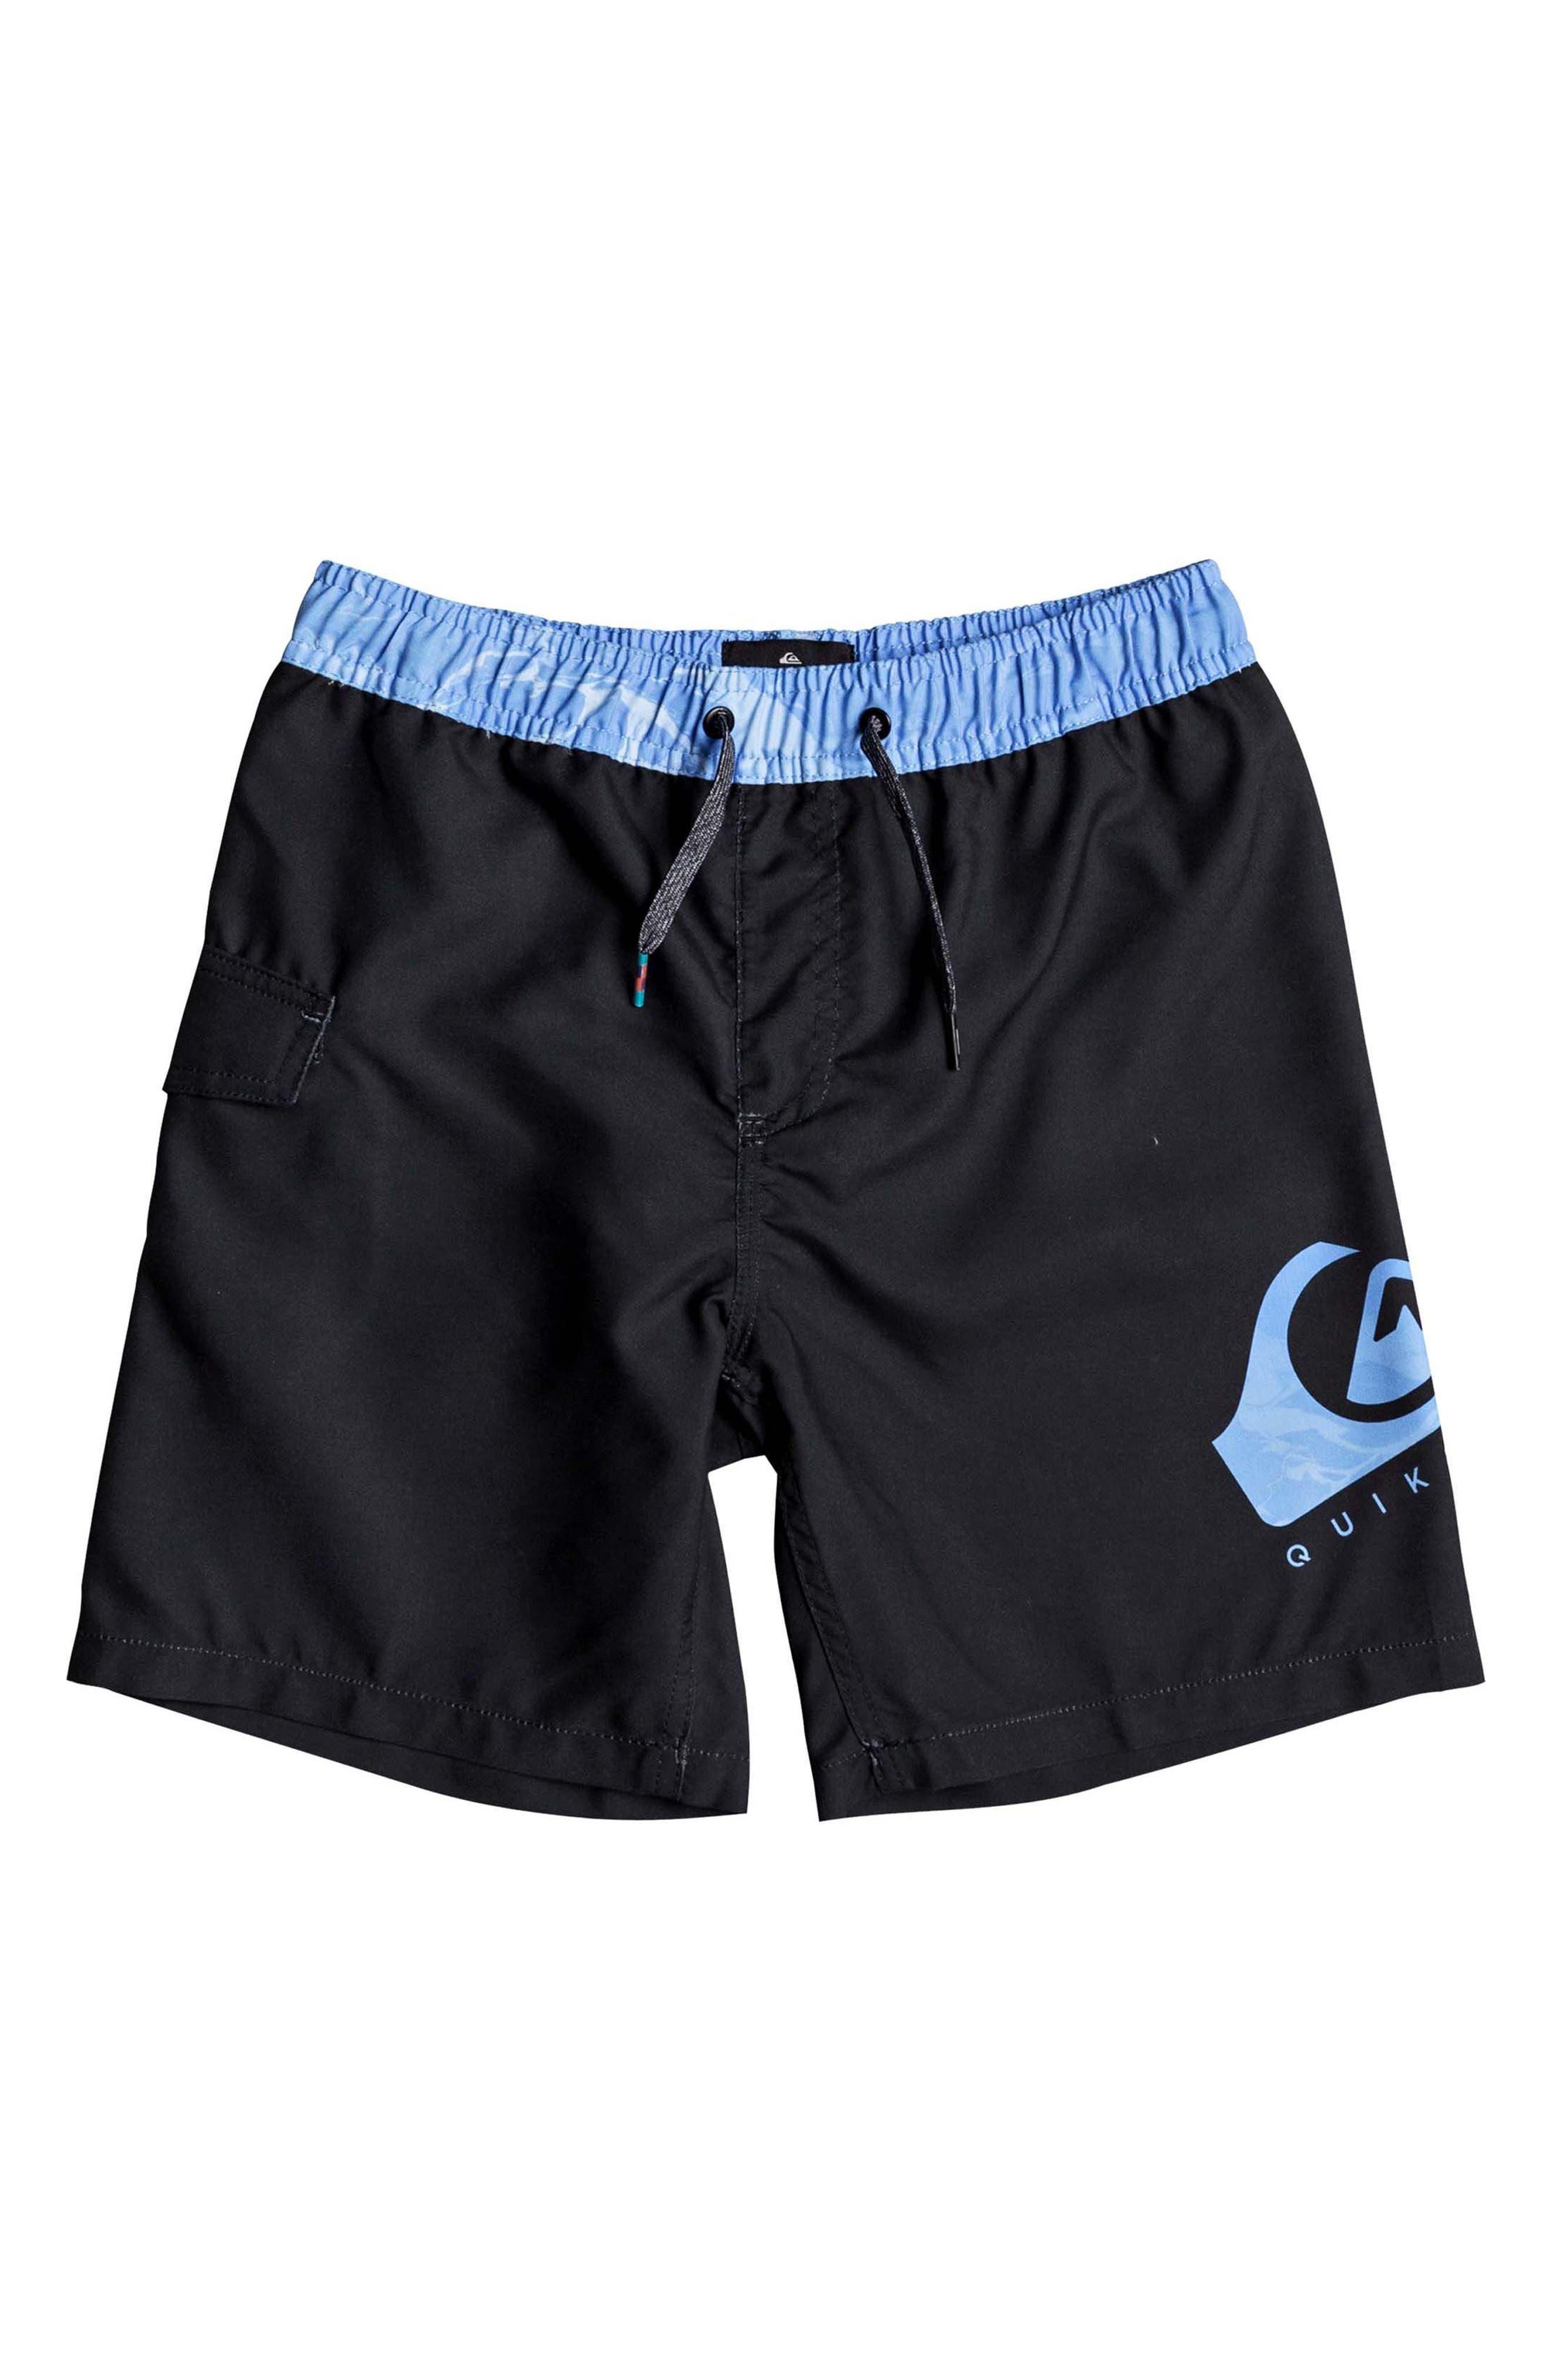 Quiksilver Lava Logo Volley Shorts (Toddler Boys & Little Boys)